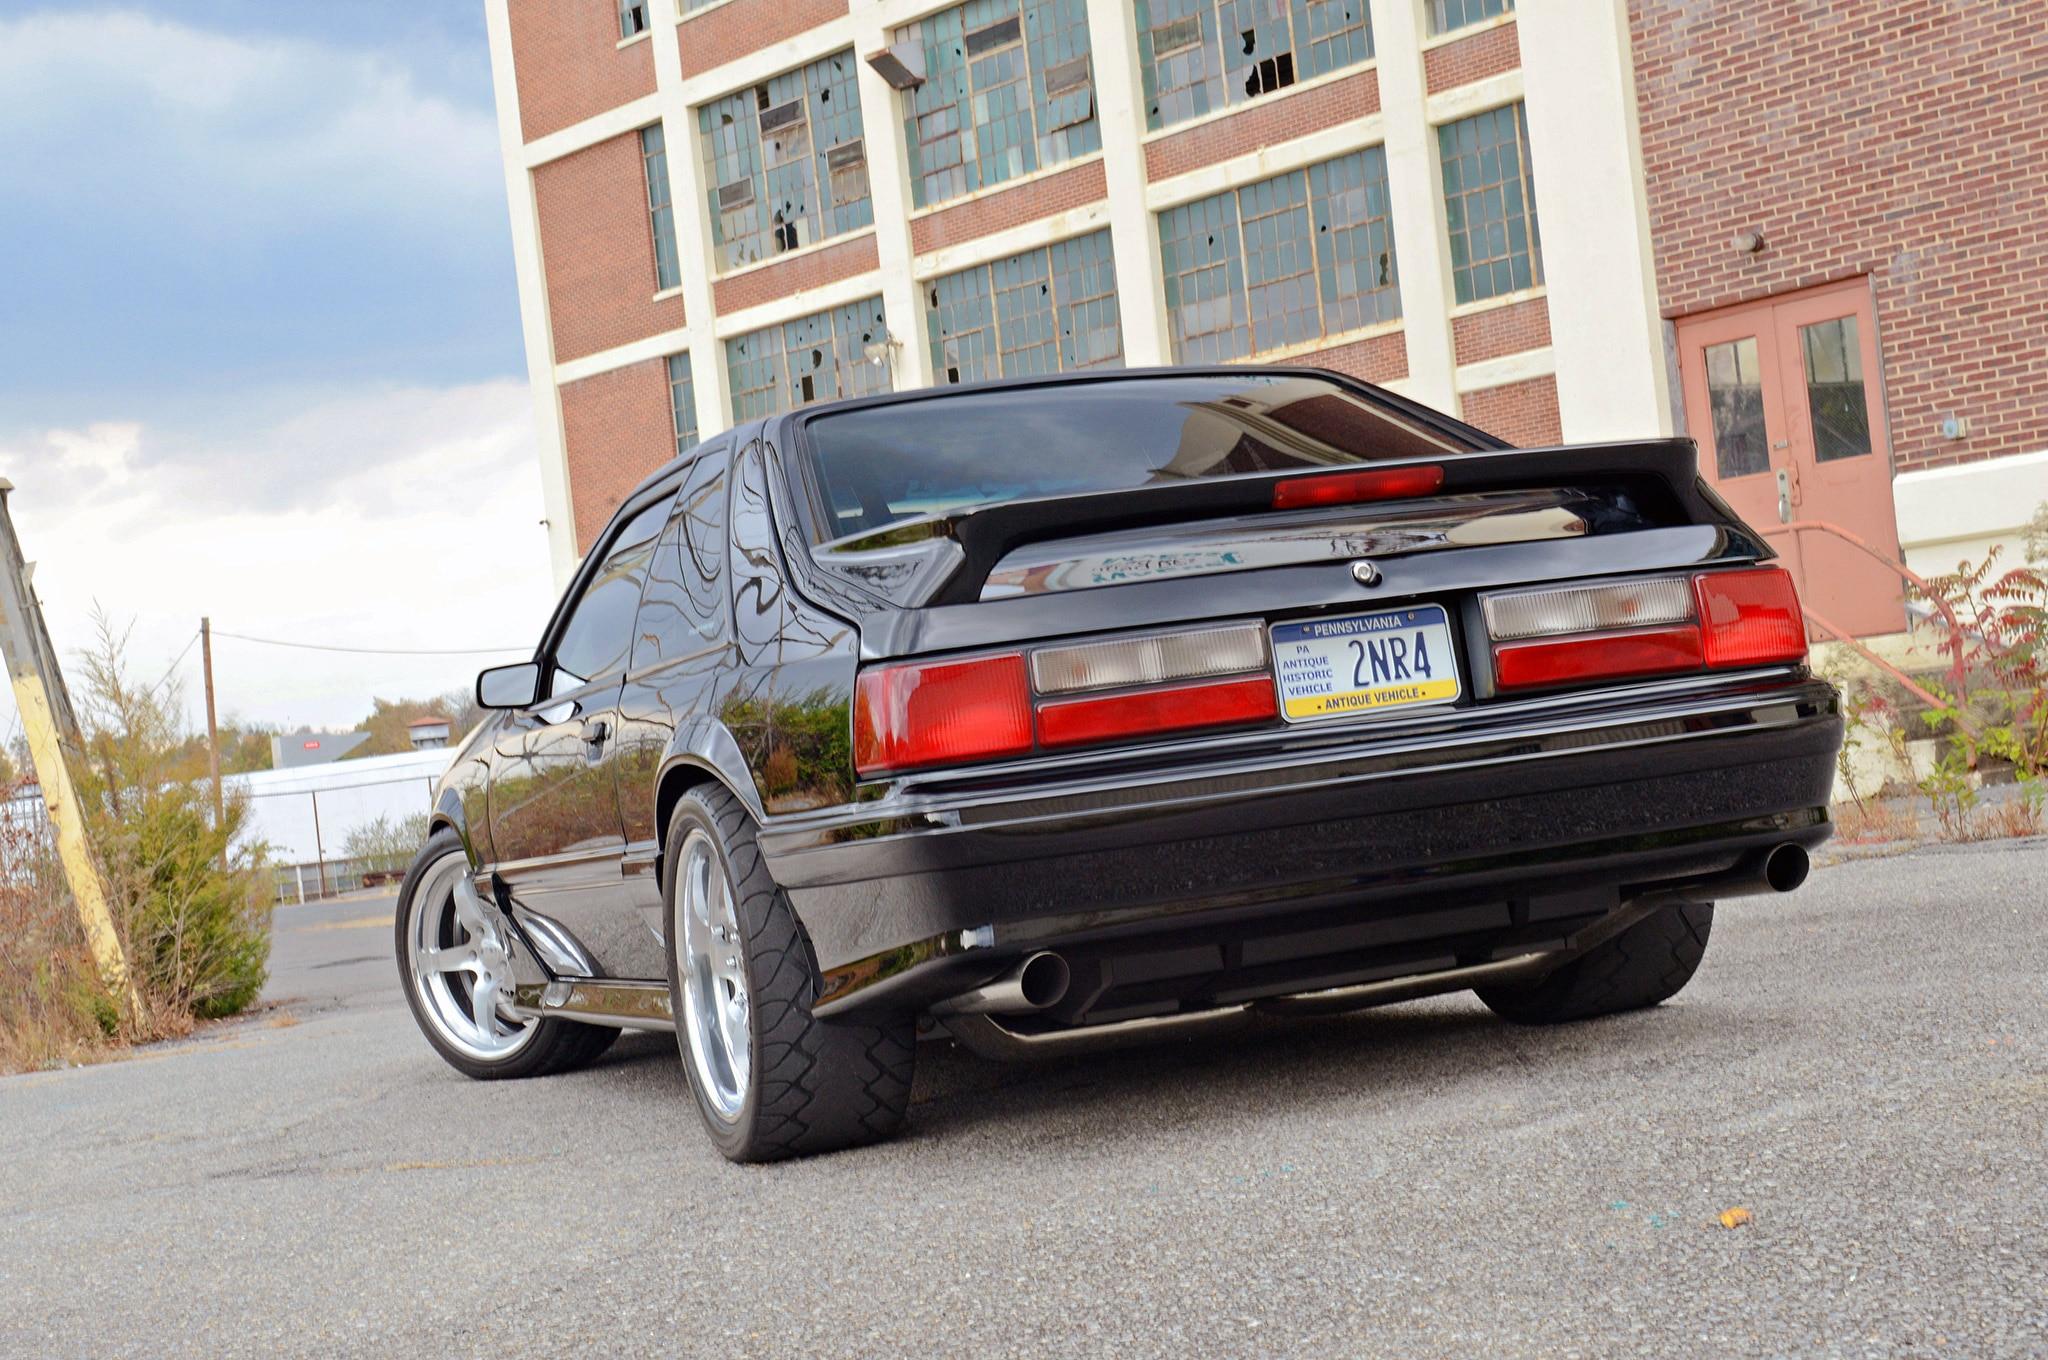 Scott 1988 Ford Mustang Gt Hartrick Gt Rear Quarter View